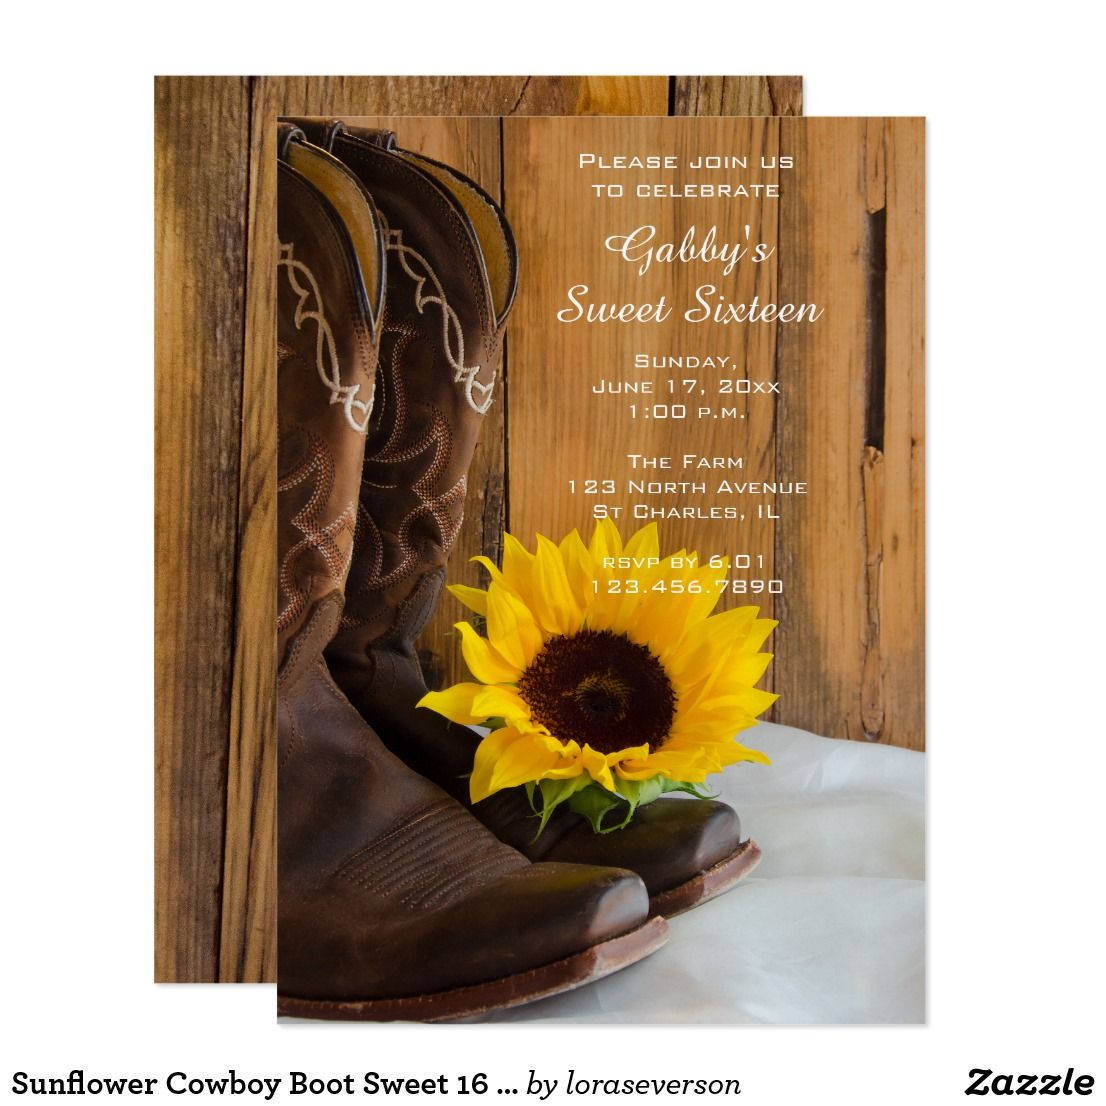 Sunflower Cowboy Boot Sweet 16 Barn Birthday Party Card | Sweet ...